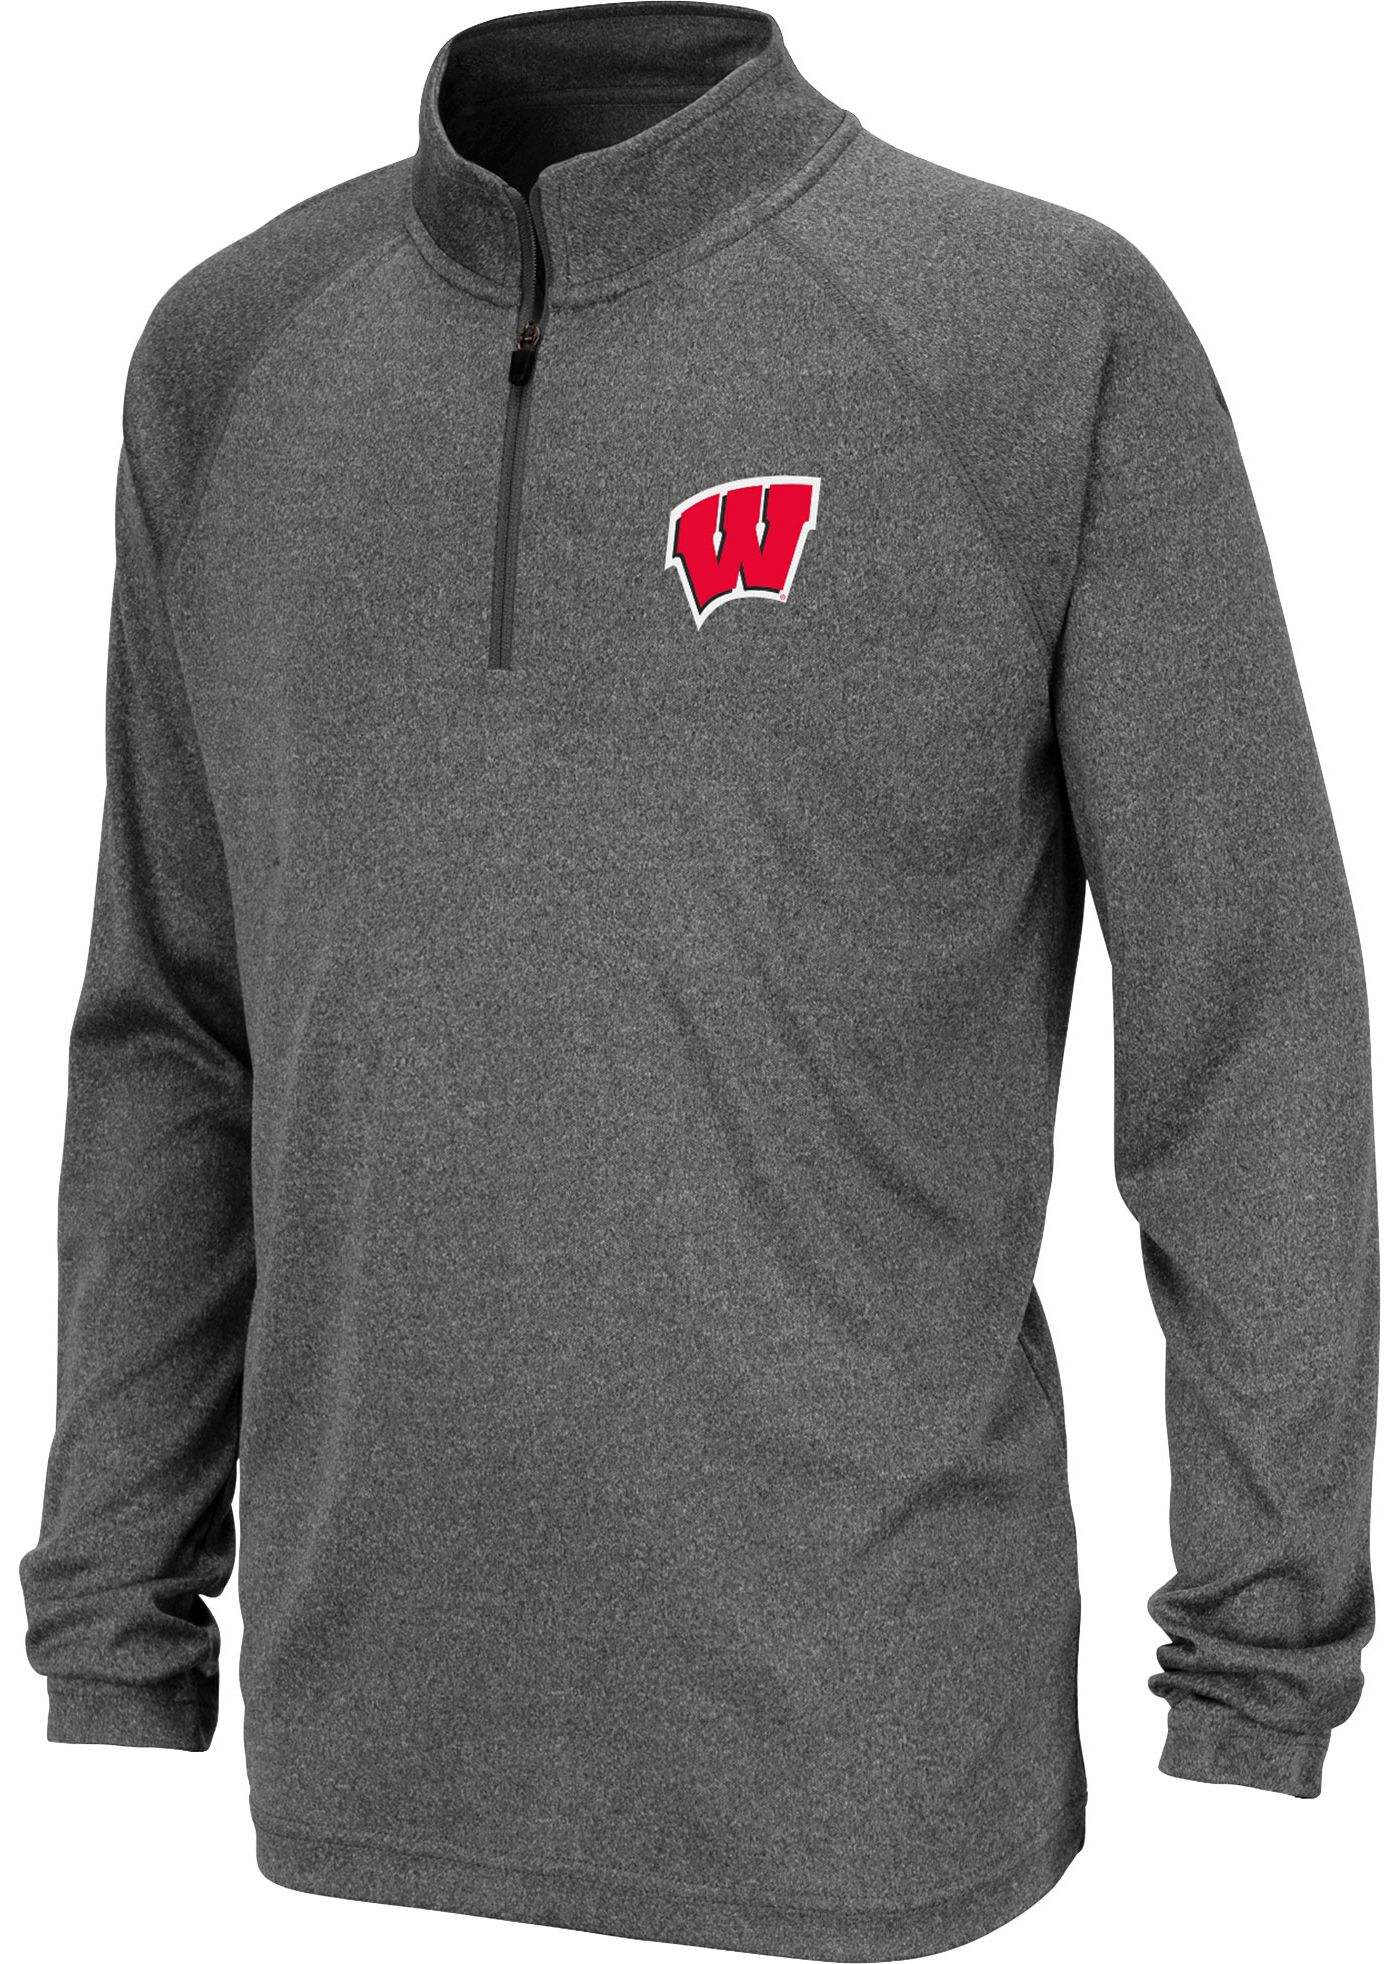 Colosseum Youth Wisconsin Badgers Grey Quarter-Zip Shirt